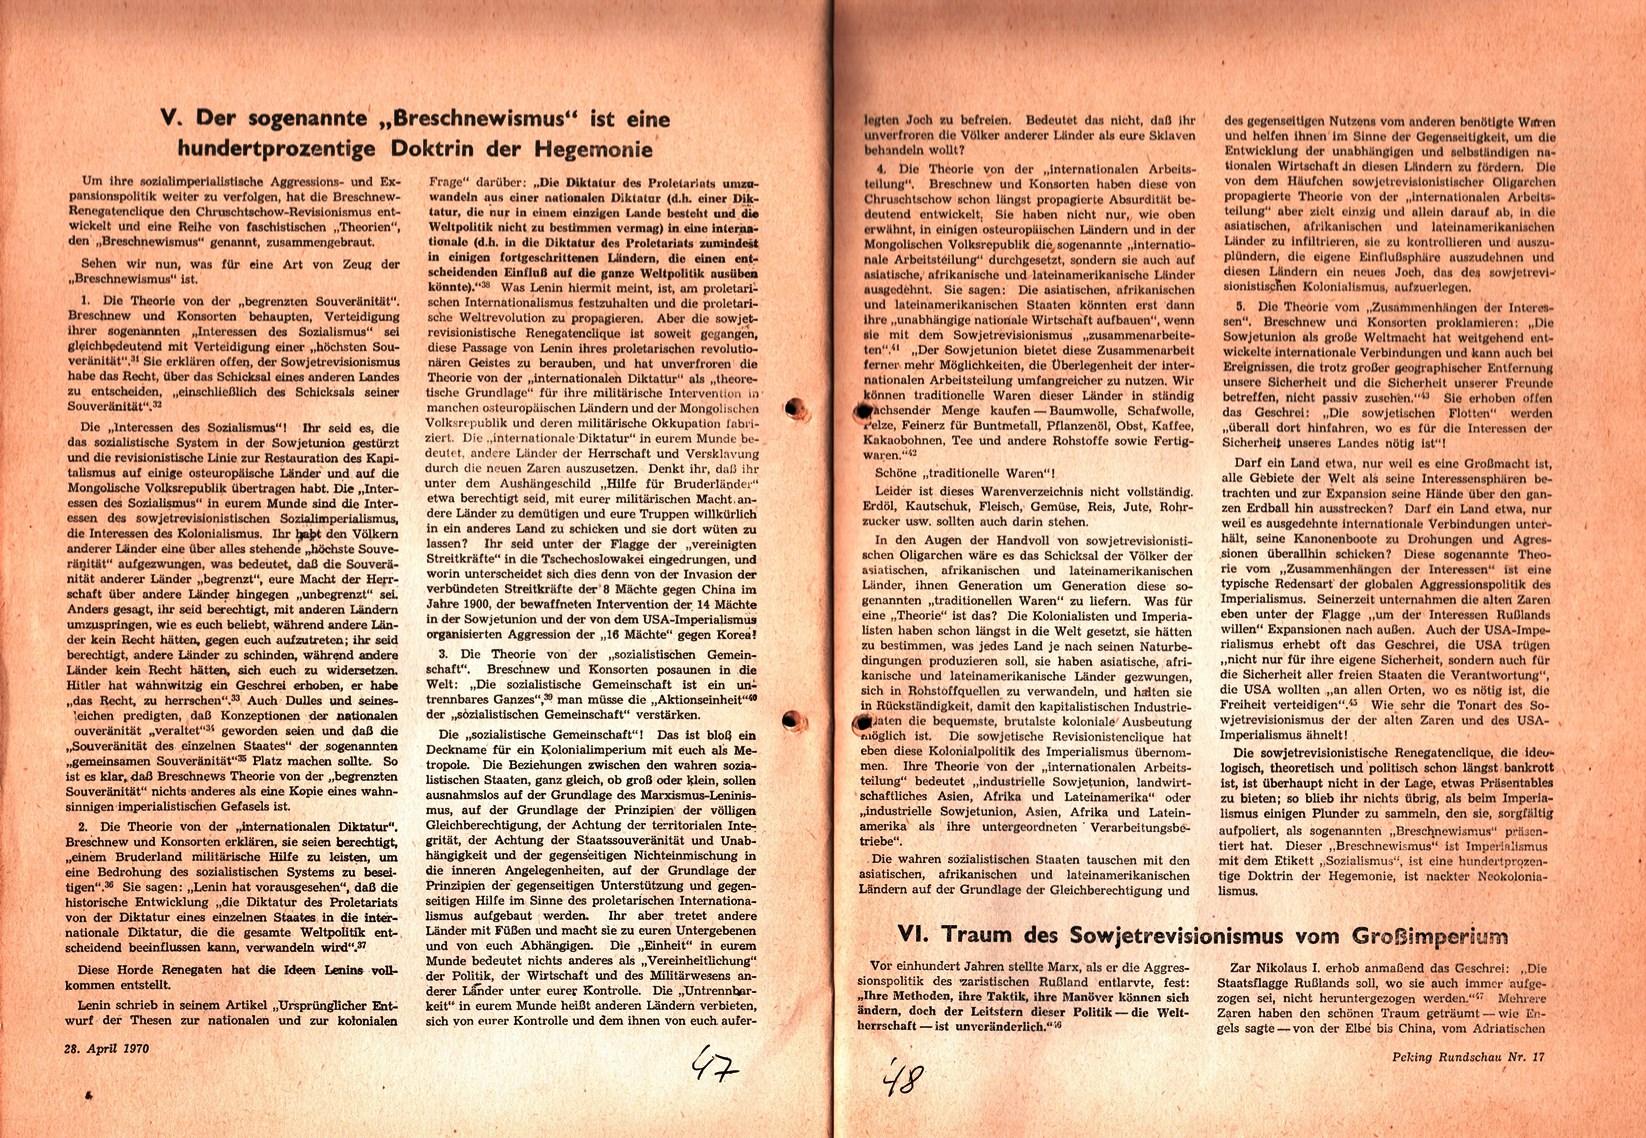 KSV_1974_Materialien_zur_Programmdiskussion_01_025